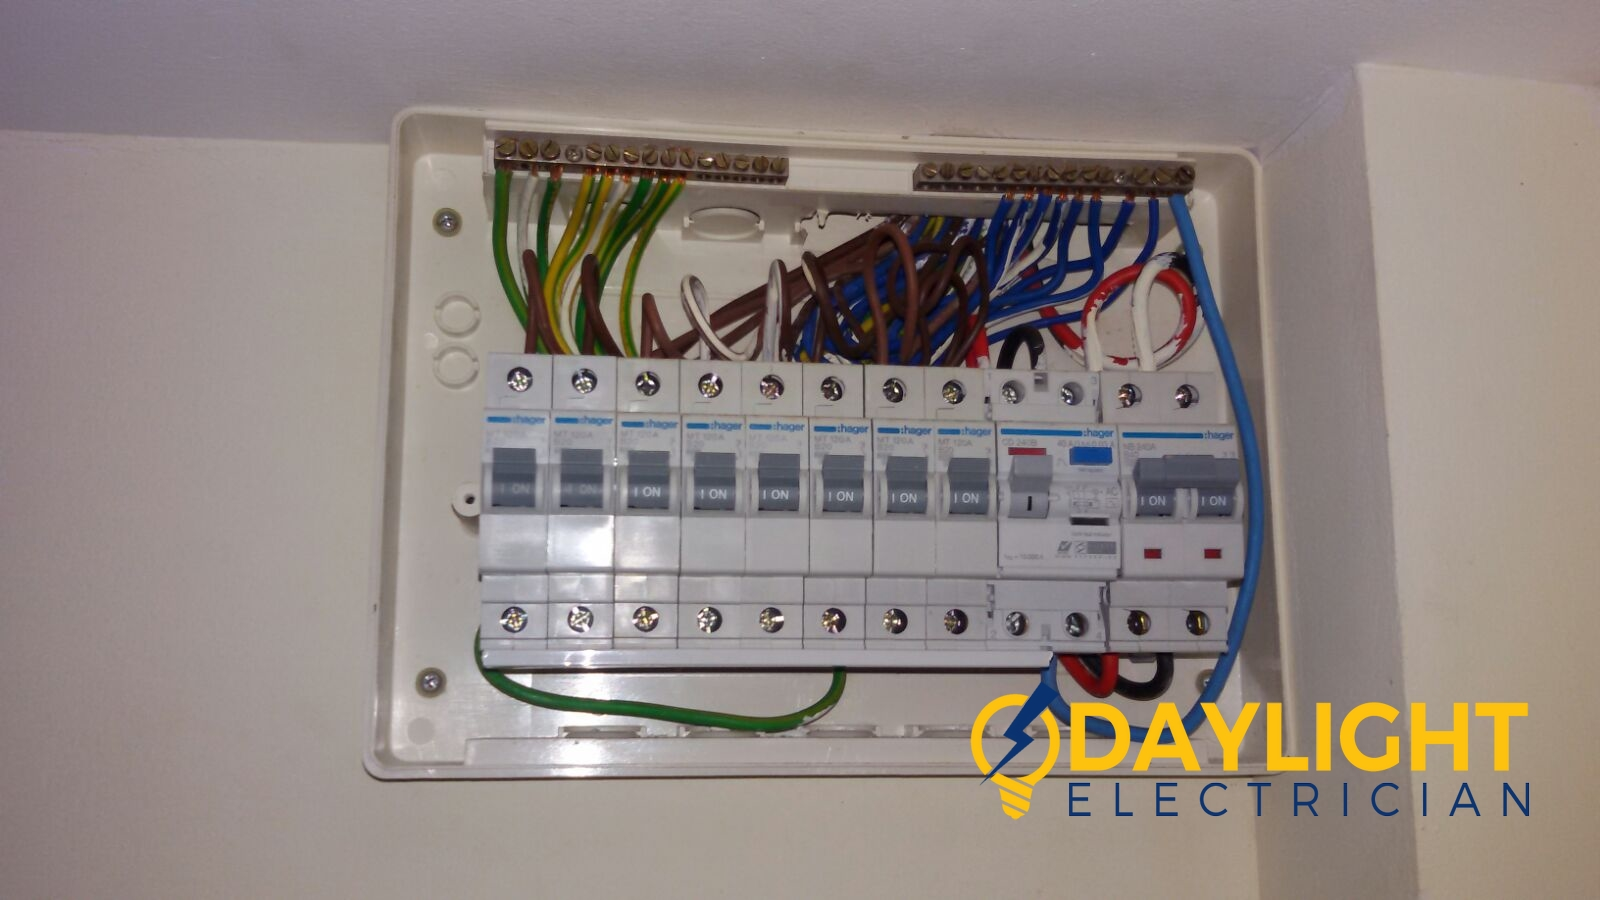 db-box-distribution-board-Change-mcb-link-bar-electrician-singapore-HDB-bishan-4_wm